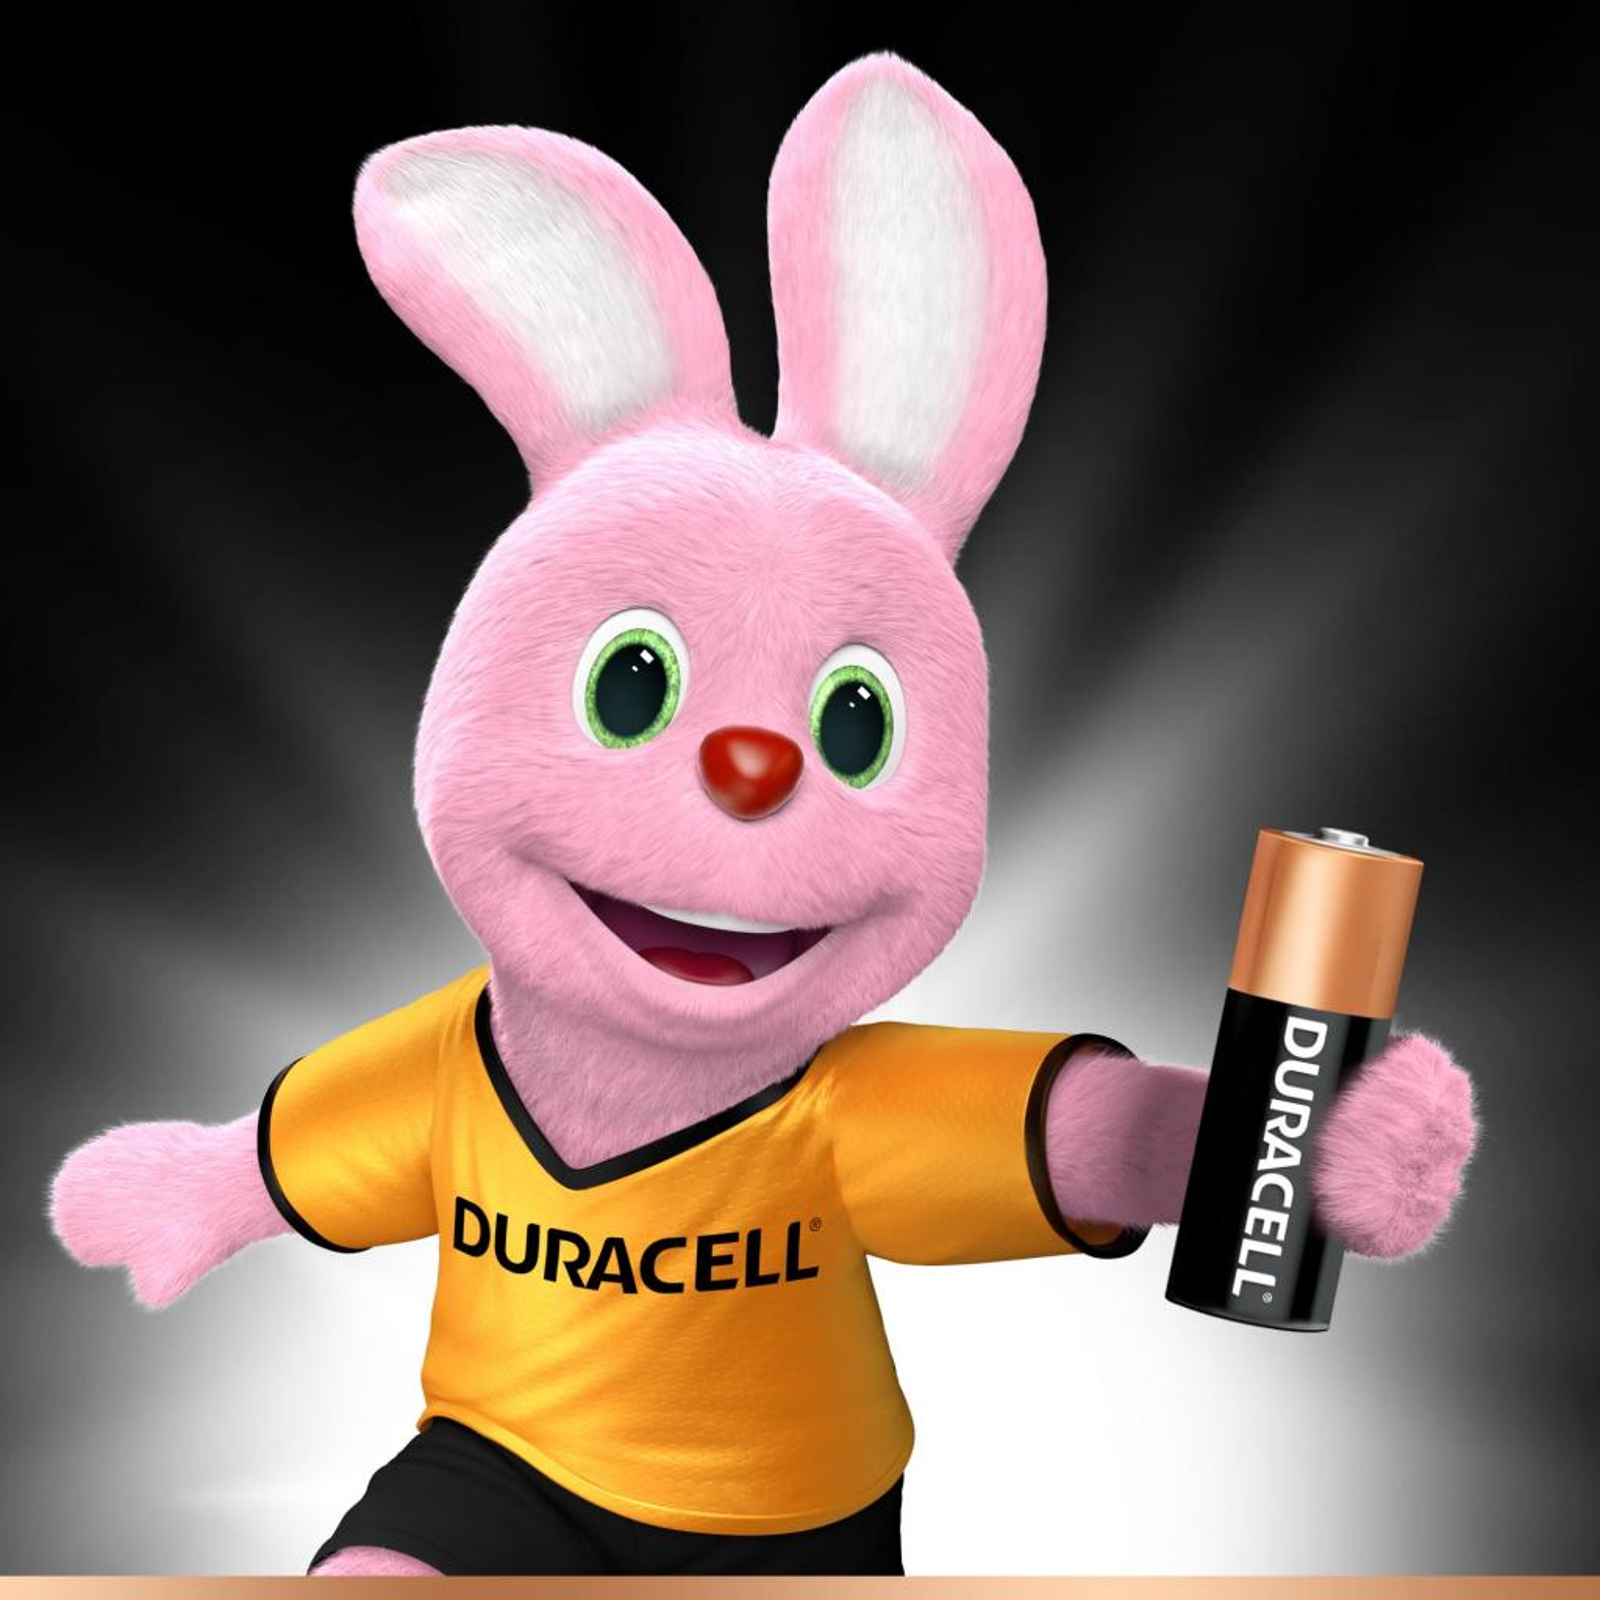 Батарейка Duracell MN27 A27 (5000394023352 / 81488674) изображение 2